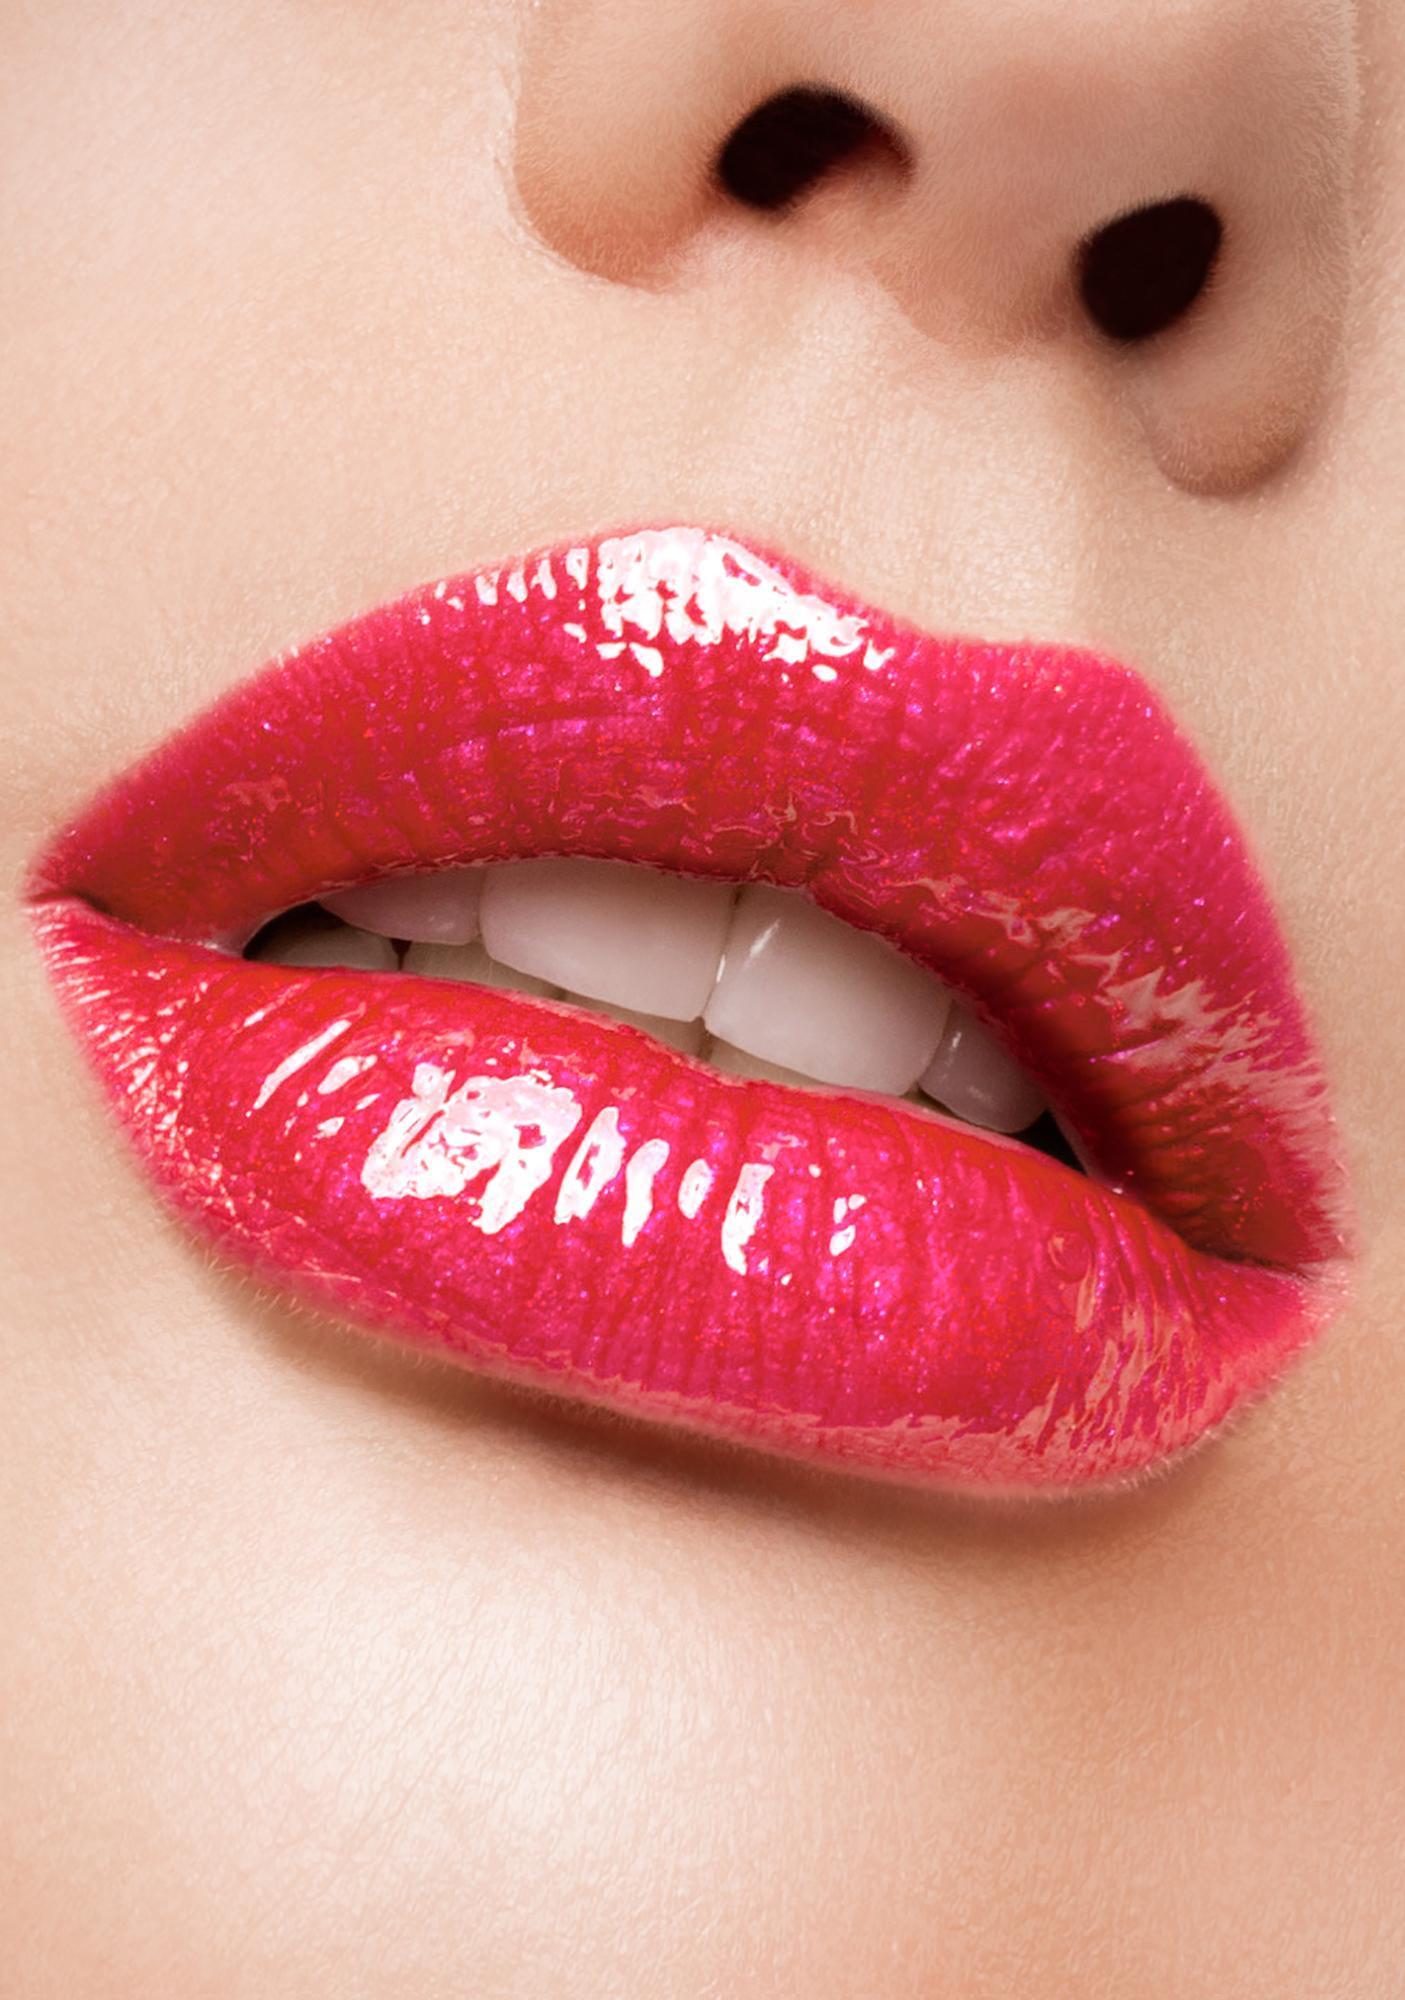 Boys Lie Big Bang Lip Gloss